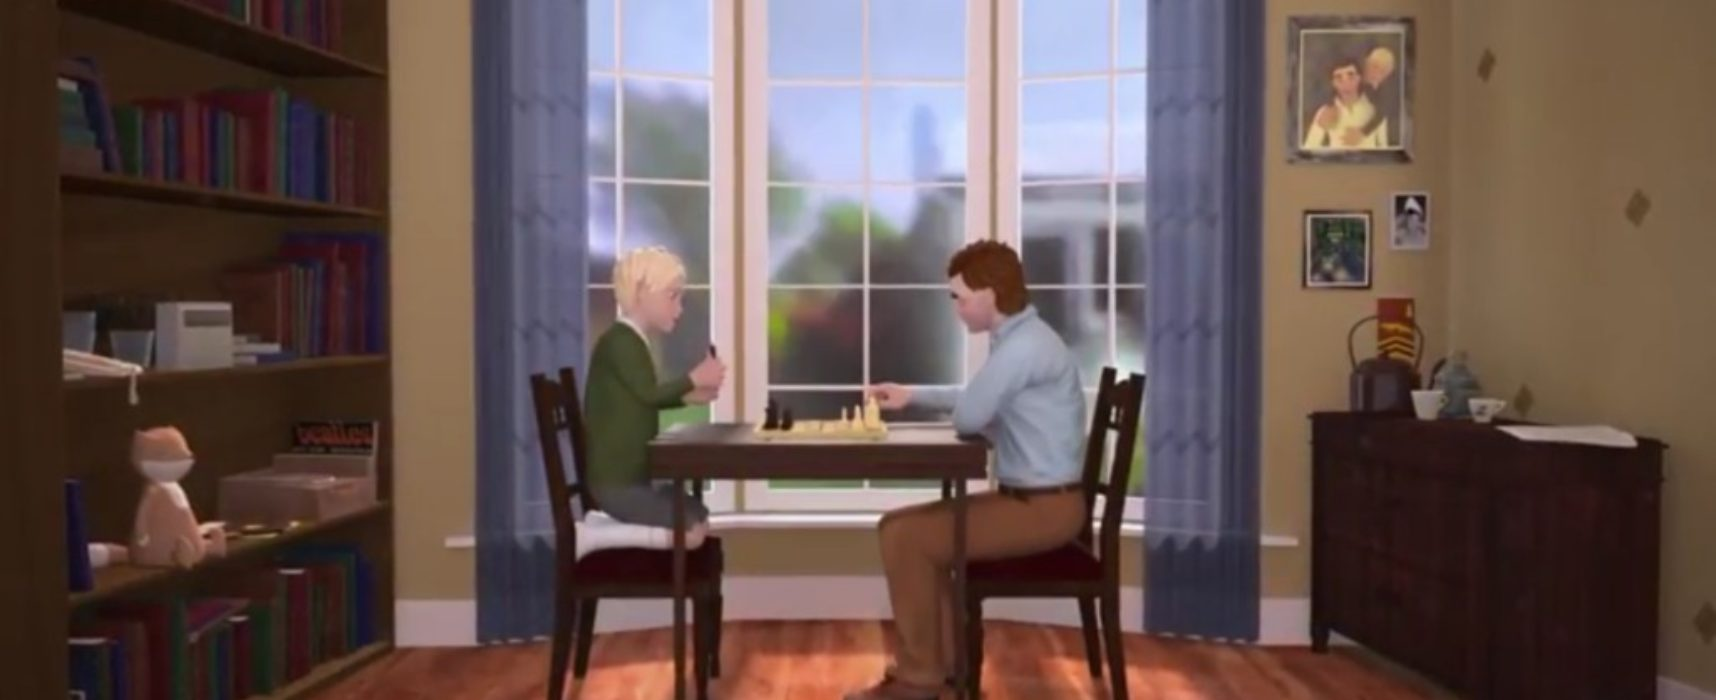 J´adoube, un precioso corto de ajedrez de Jessica Kersey-Preston